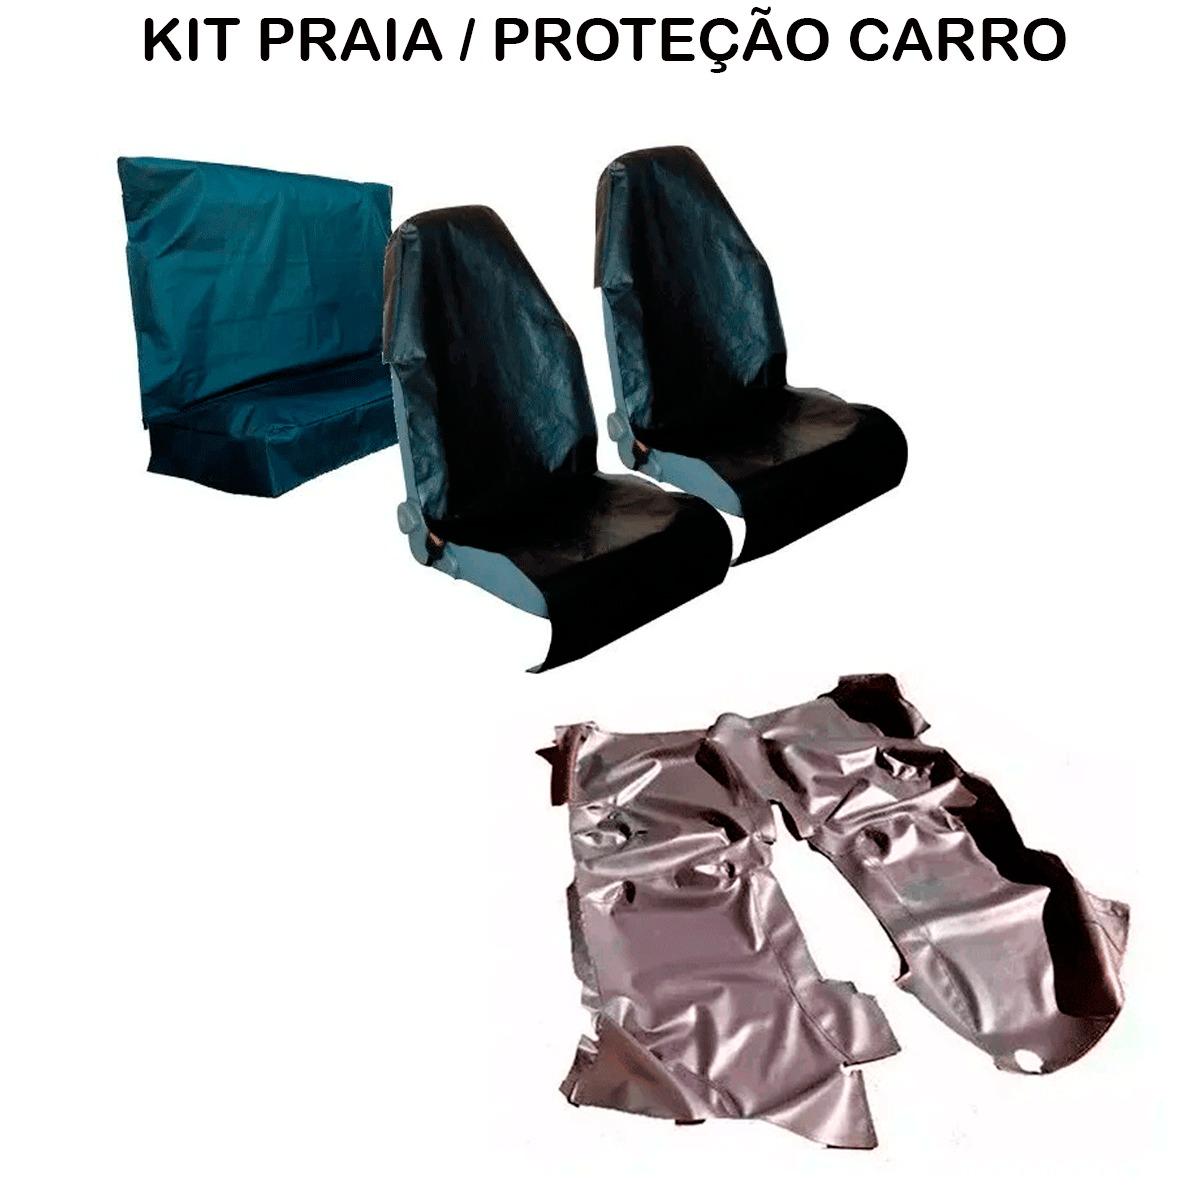 Tapete Em Vinil Ford Verona todos + Capa Banco Protecao Banco Areia Suor Academia